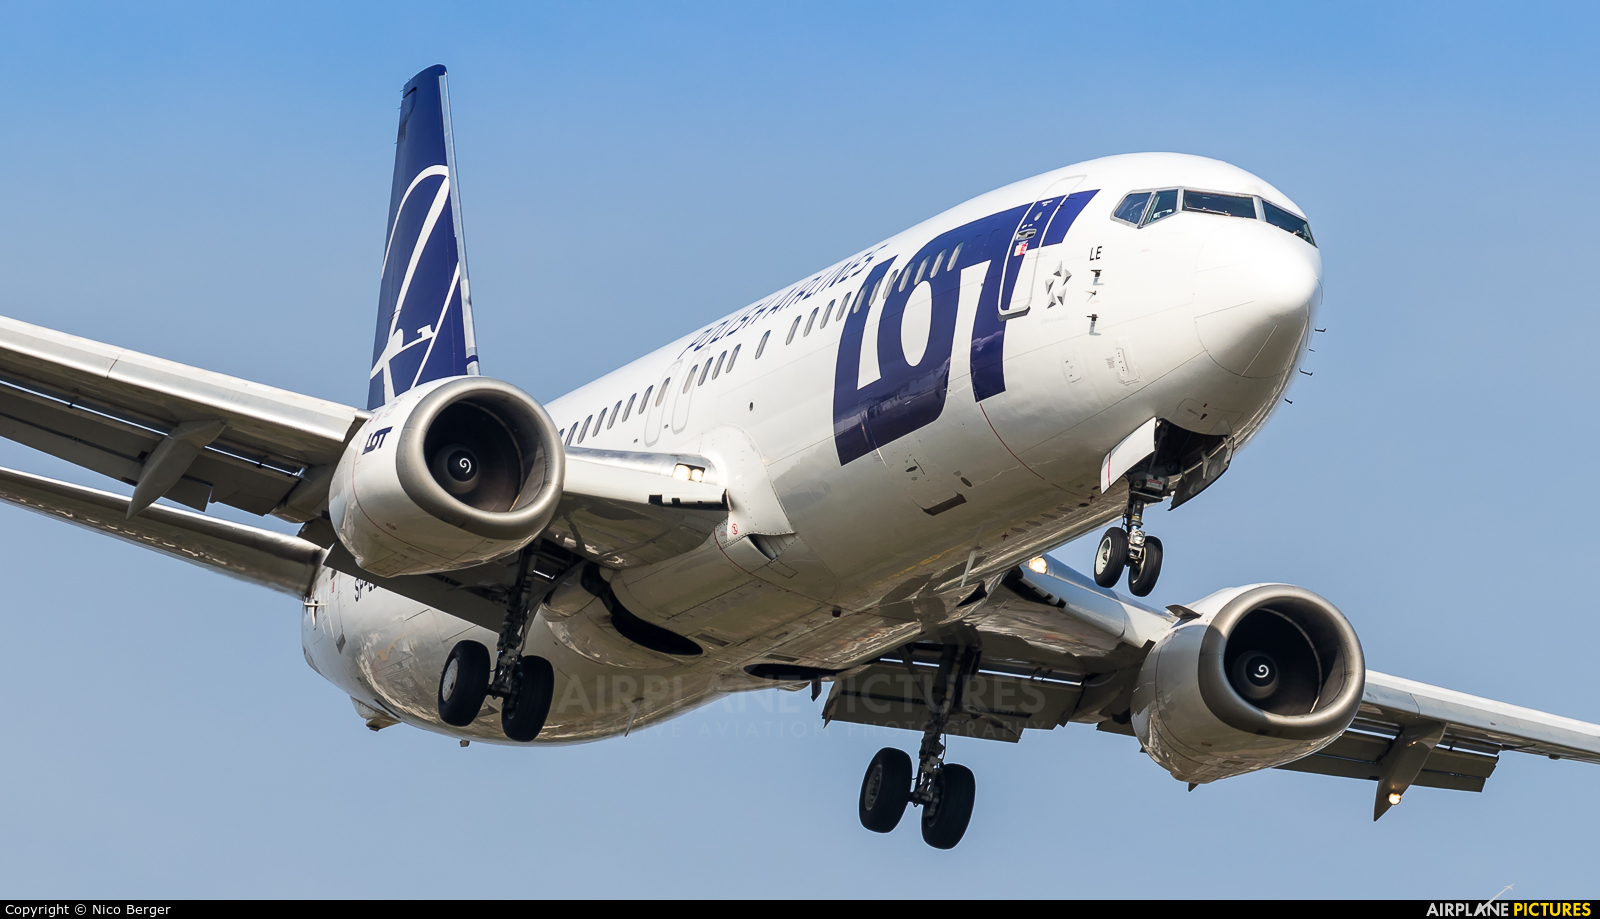 LOT - Polish Airlines SP-LLE aircraft at Frankfurt